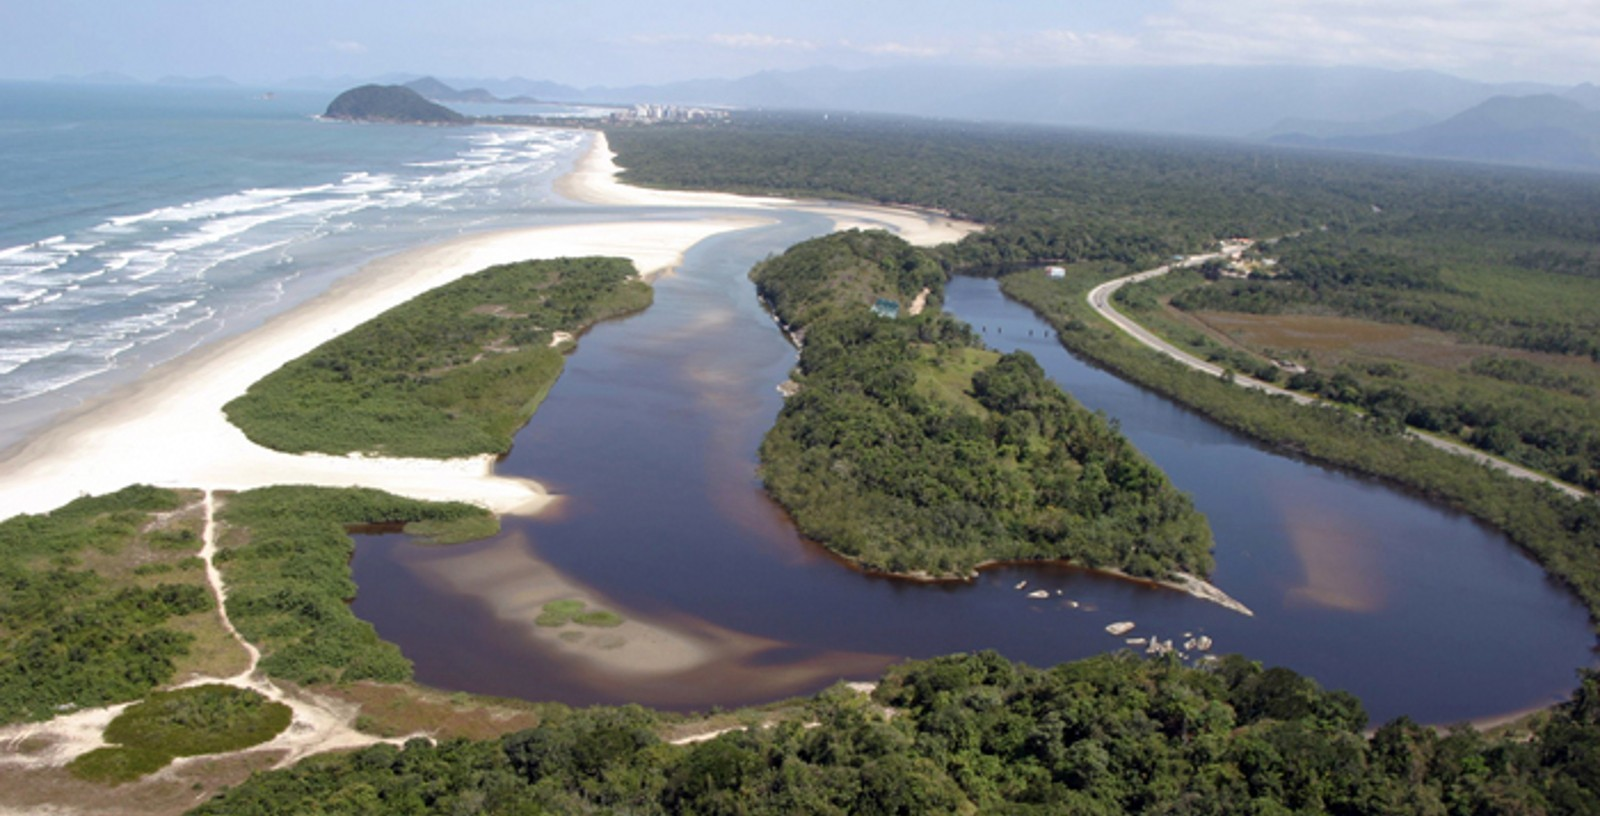 Sea_Environmental_Protection_Sao-Paulo_Brasil_IDOM_1